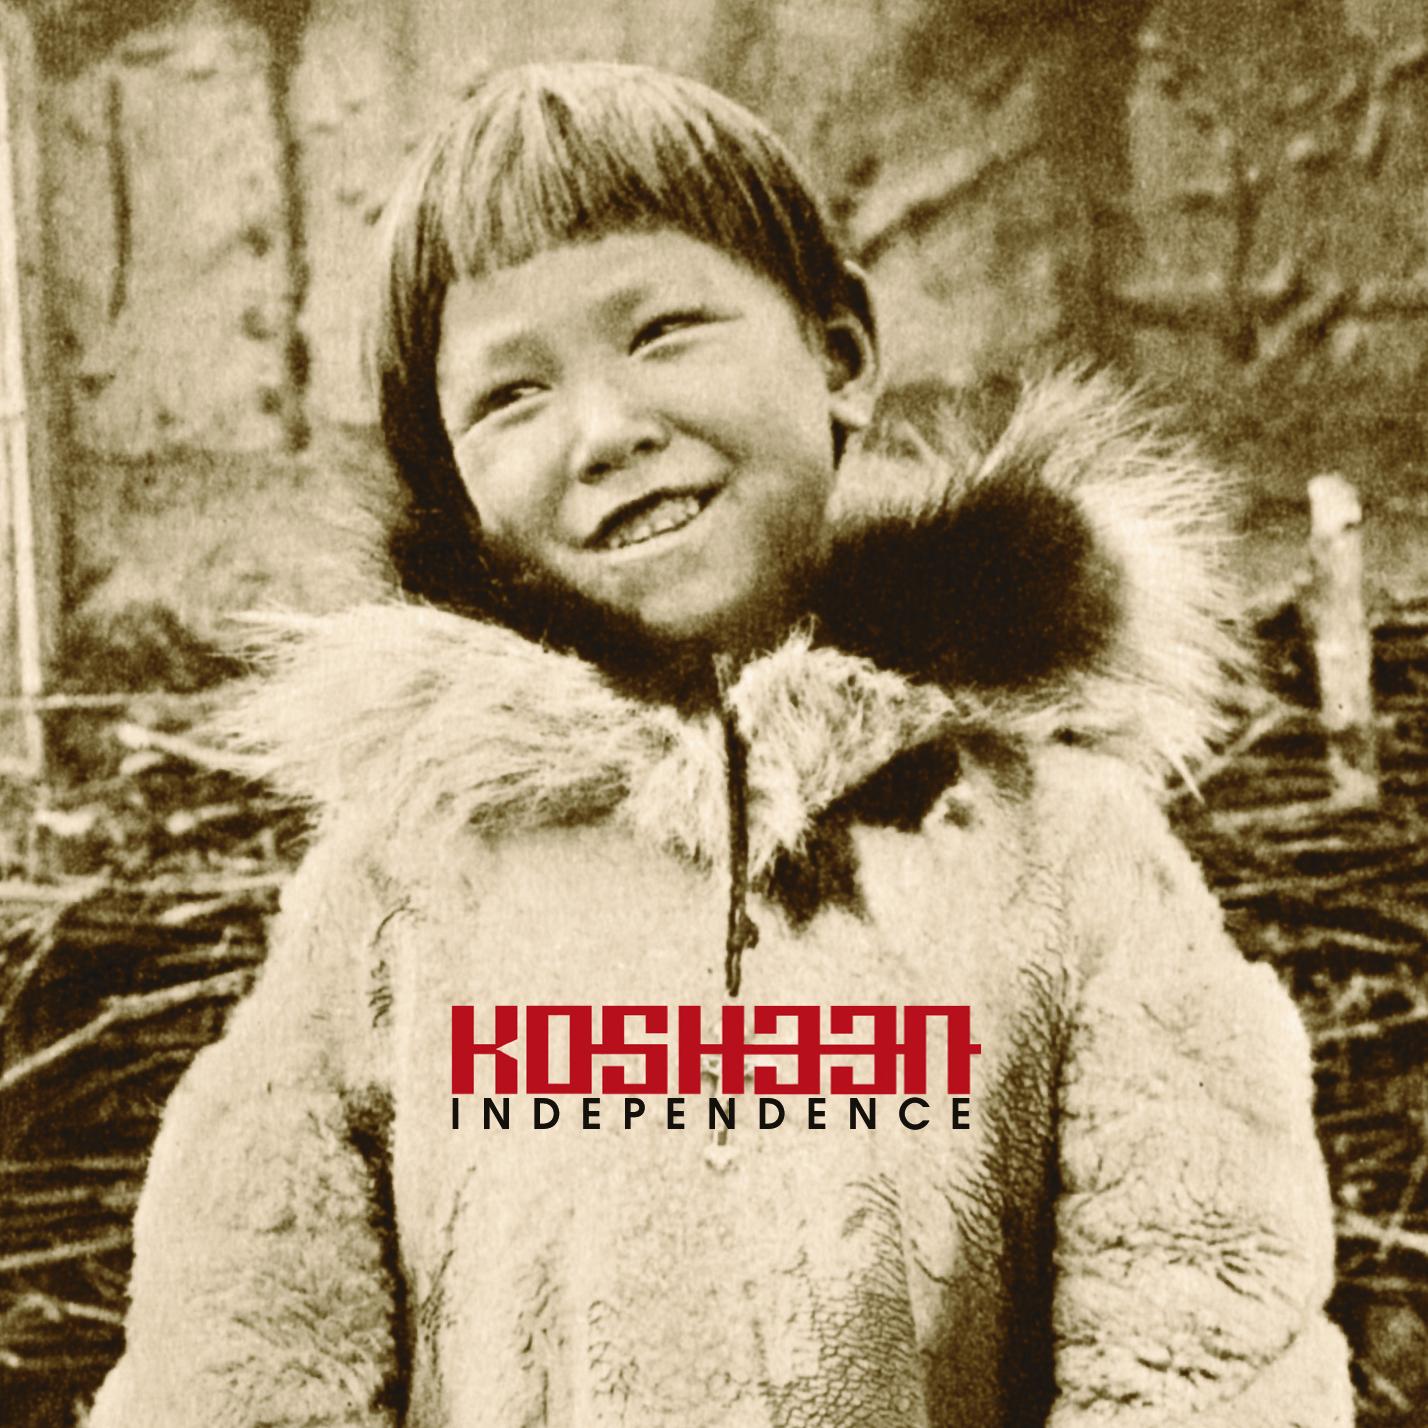 Kosheen - Harder They Fall